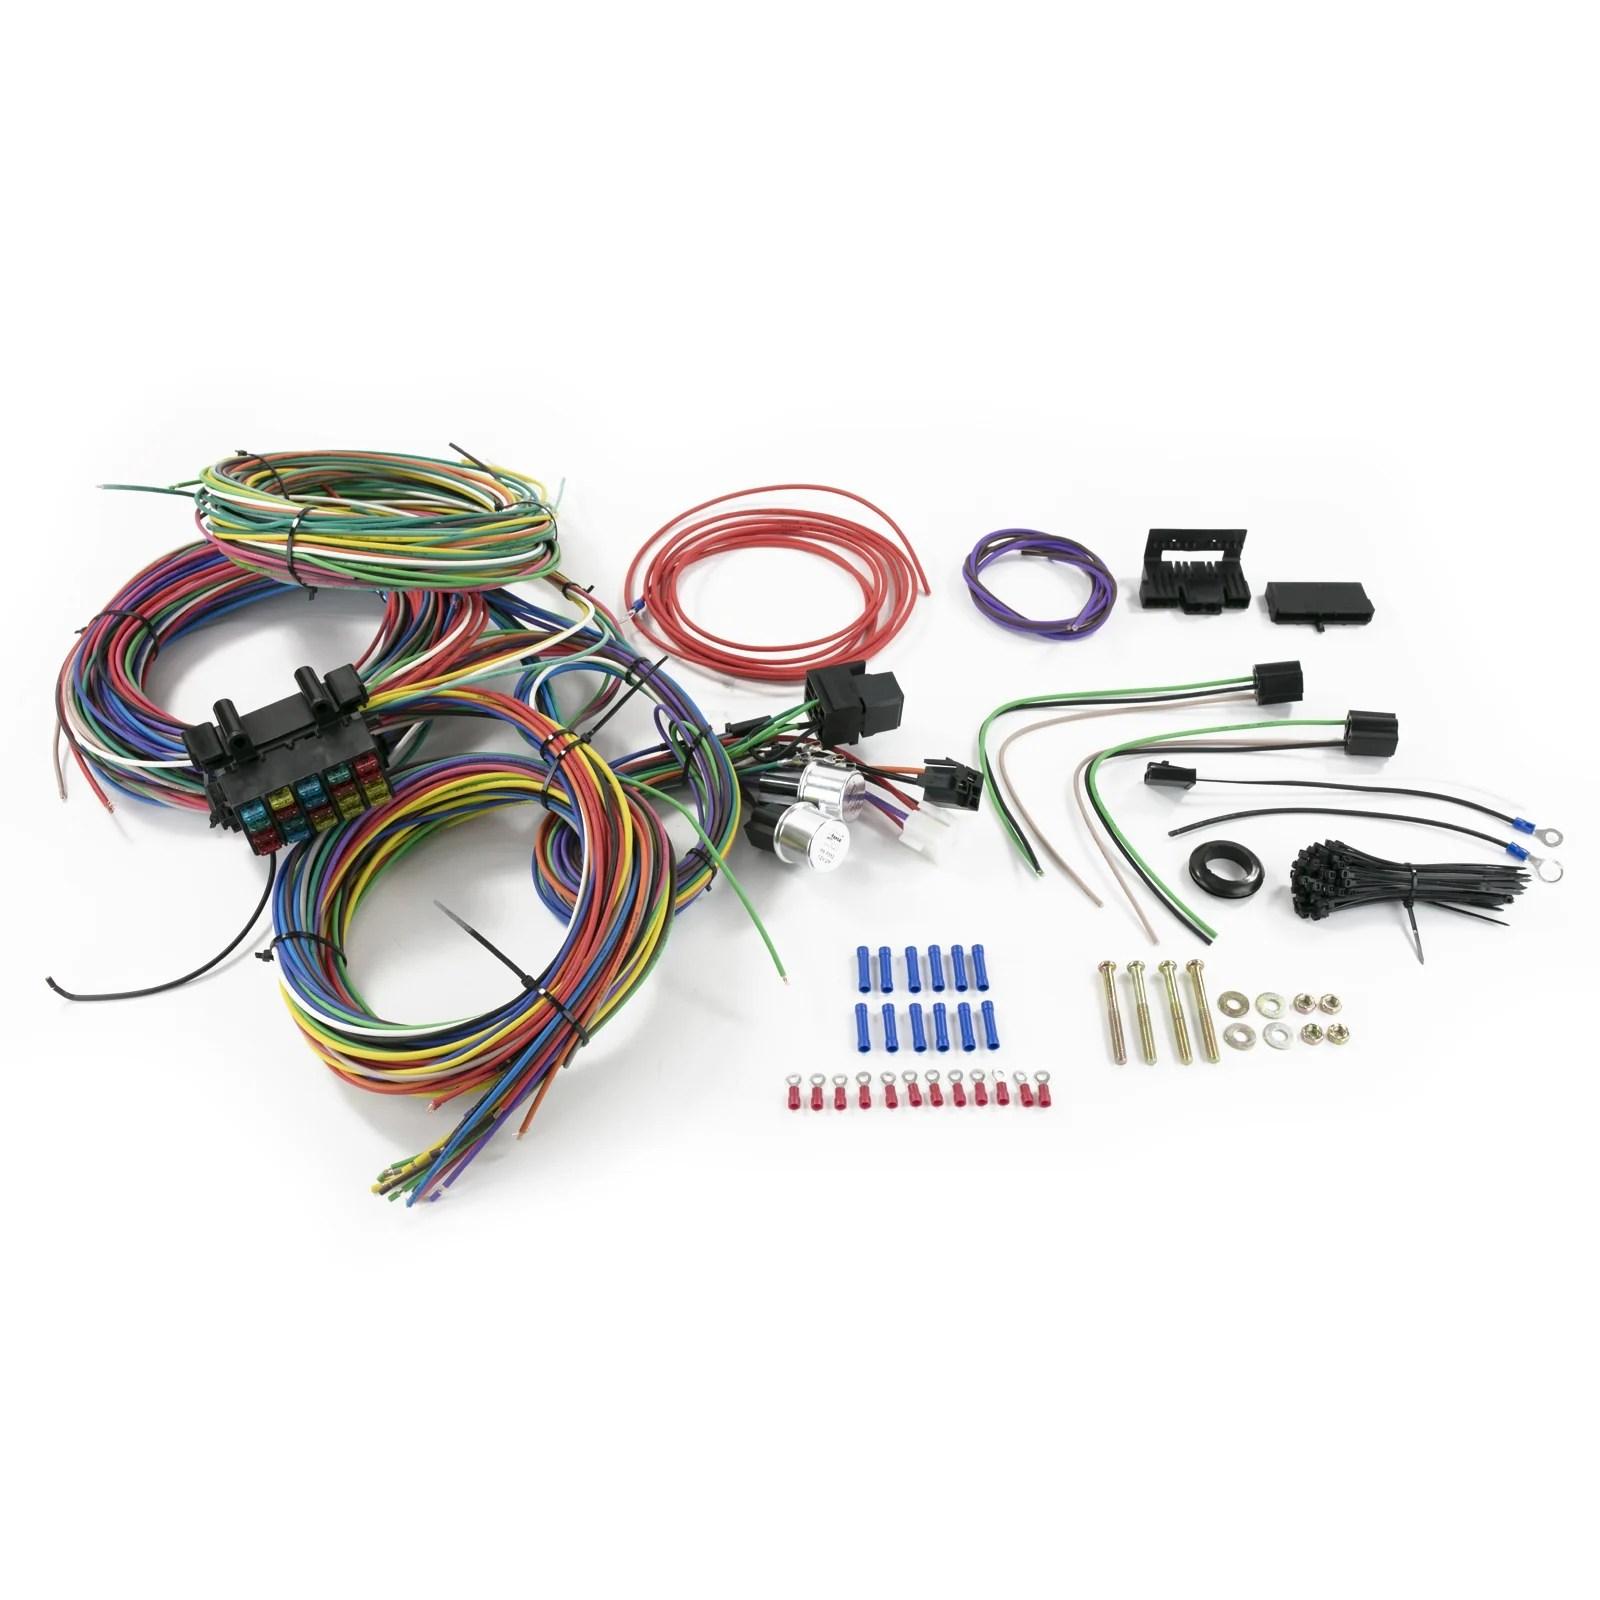 hight resolution of wiring harness universal 240z 260z 280z 510 z car depot 280z ez wiring harness 280z wiring harness